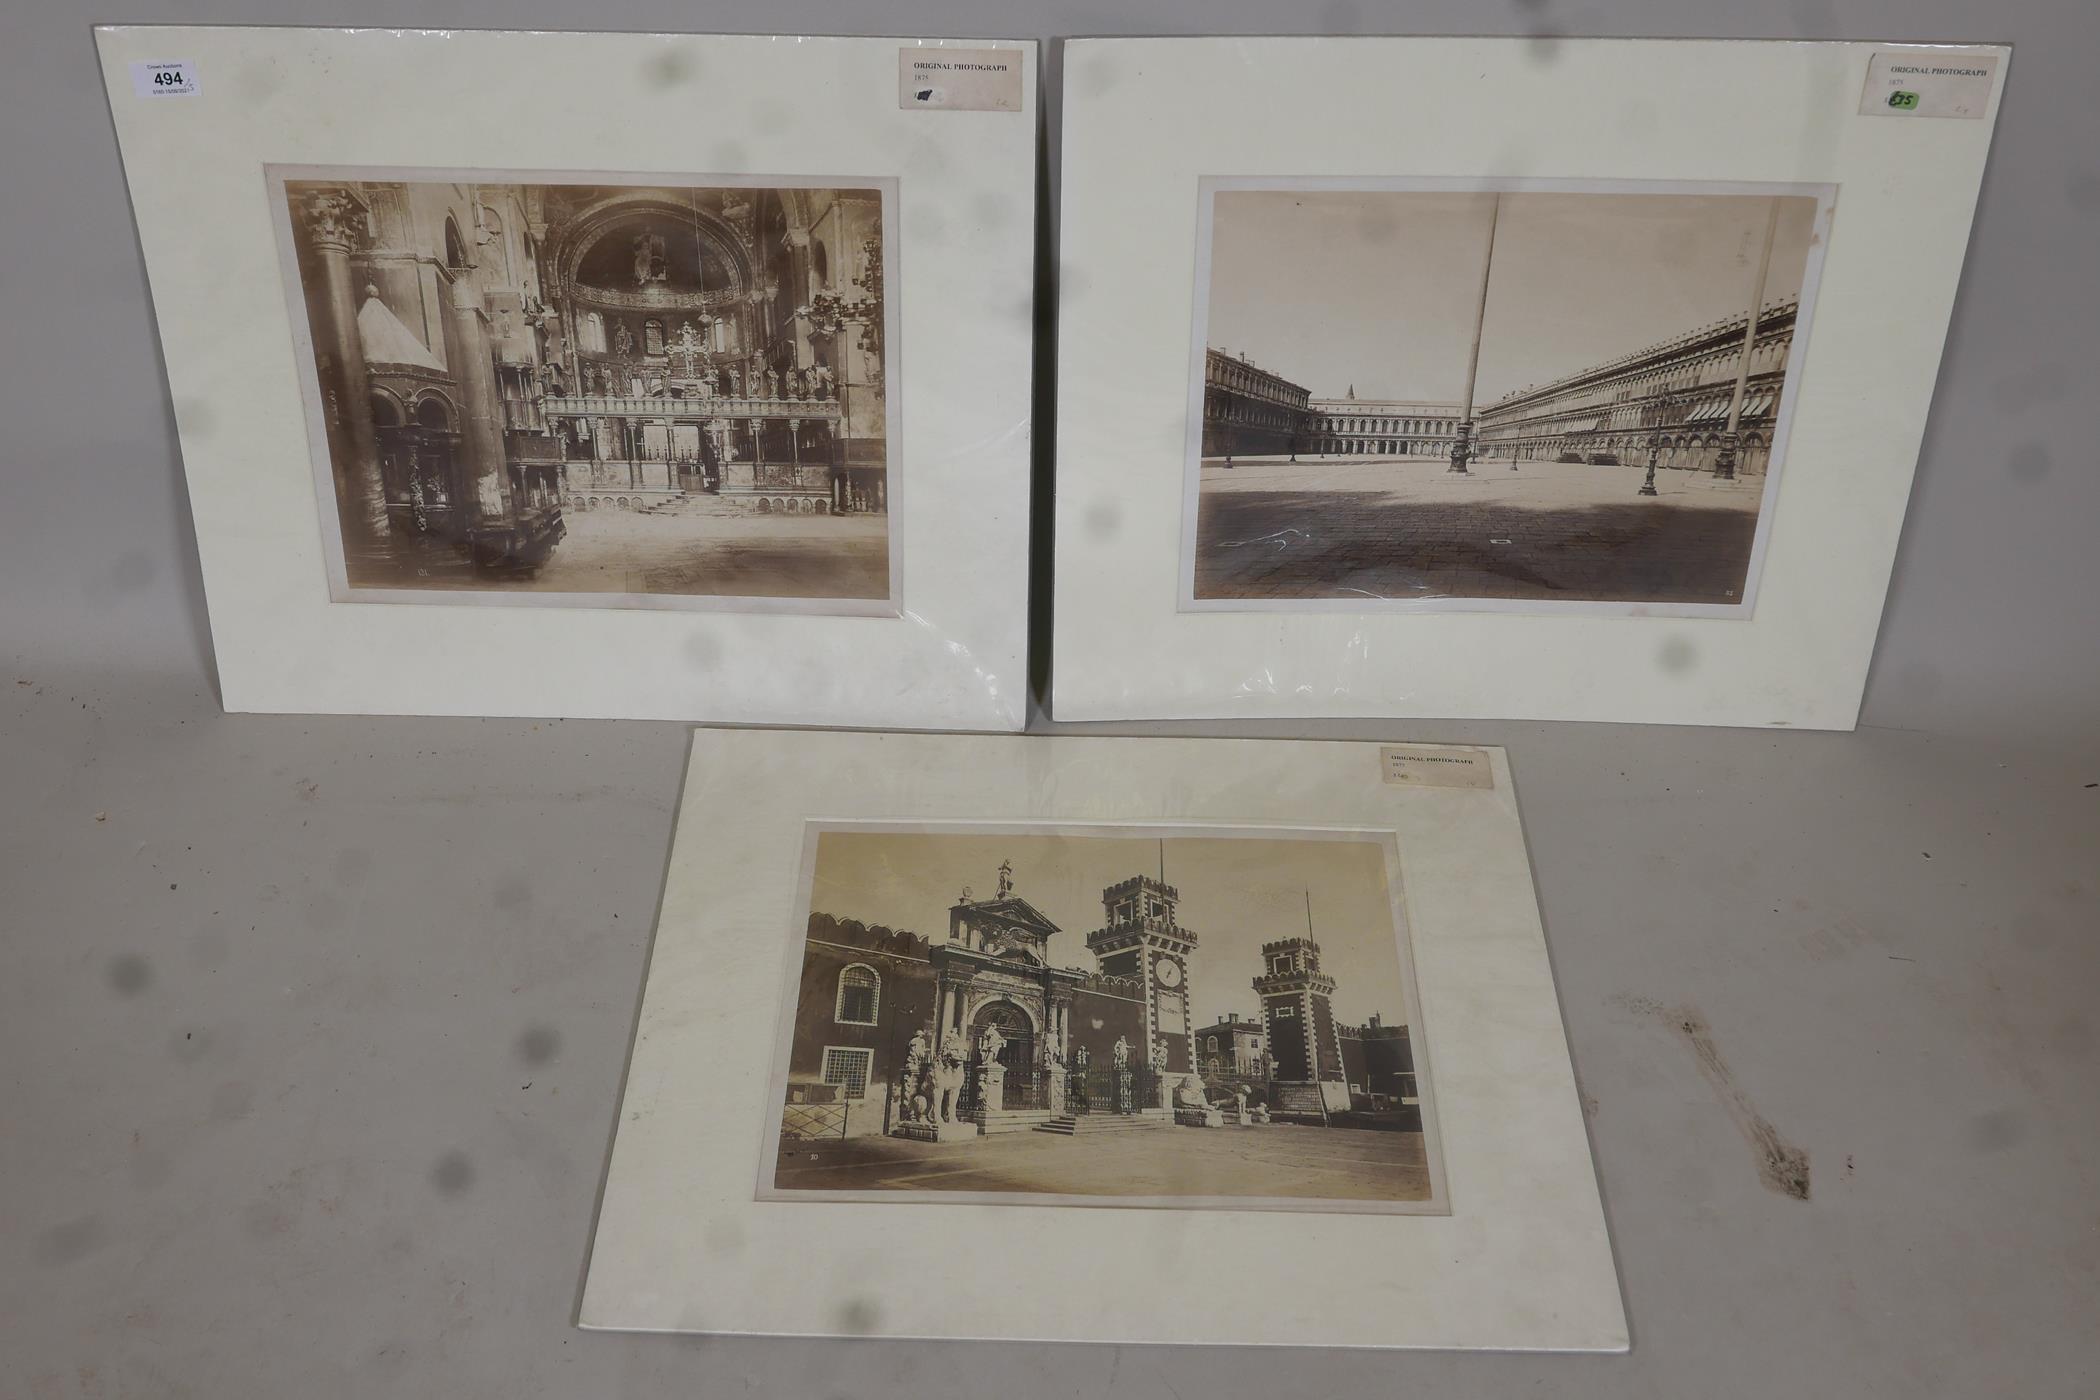 Three original sepia photographs of C19th Venice, Piazza di San Marco, the Basilica and the Arsenal,